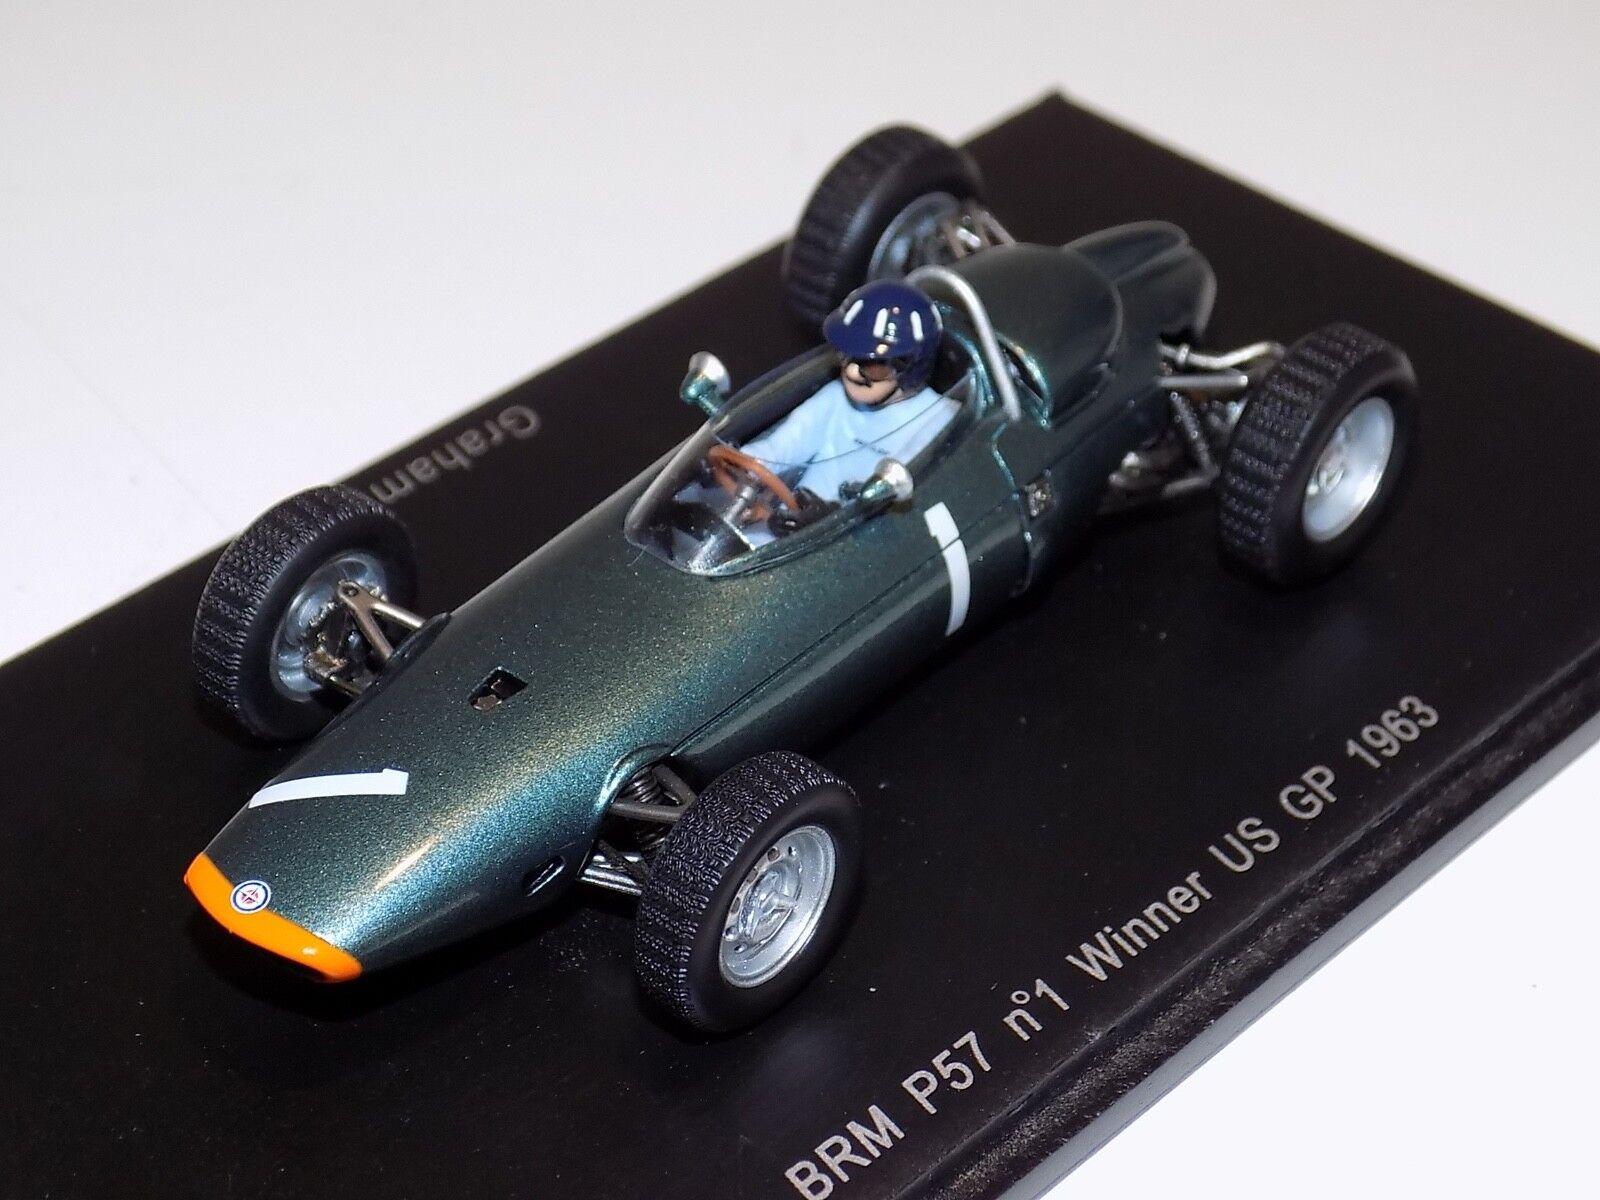 1 43 Spark F1 FORMULE 1 BRM P57 voiture  1 Winner US GRAND PRIX Graham Hill 1963 S1152